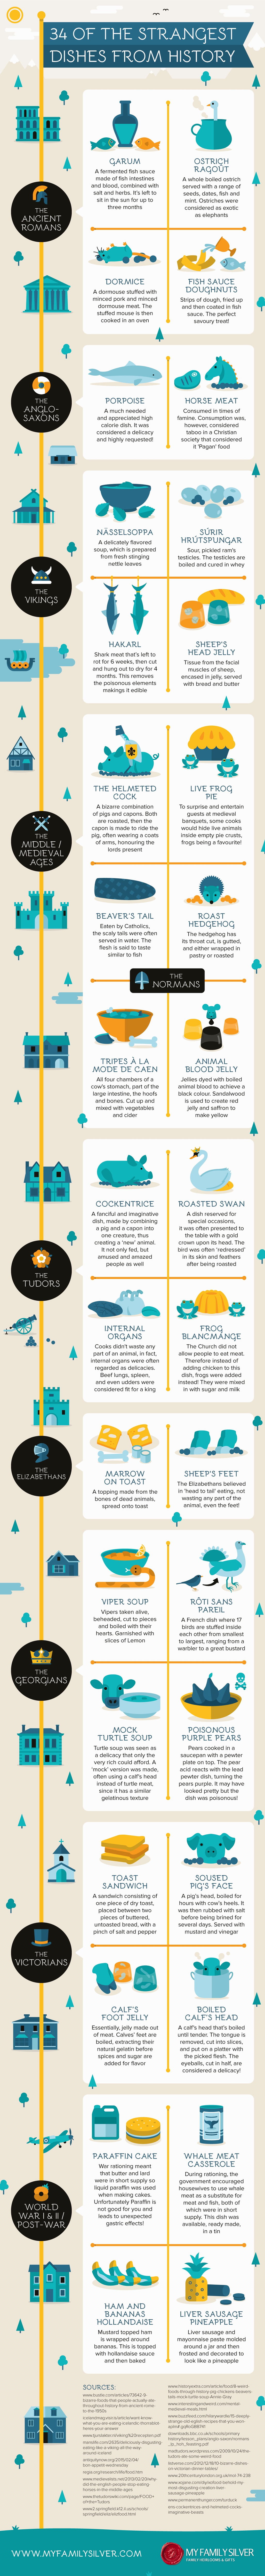 Súrir Hrútspungar and More: Strangest Dishes in History - Infographic